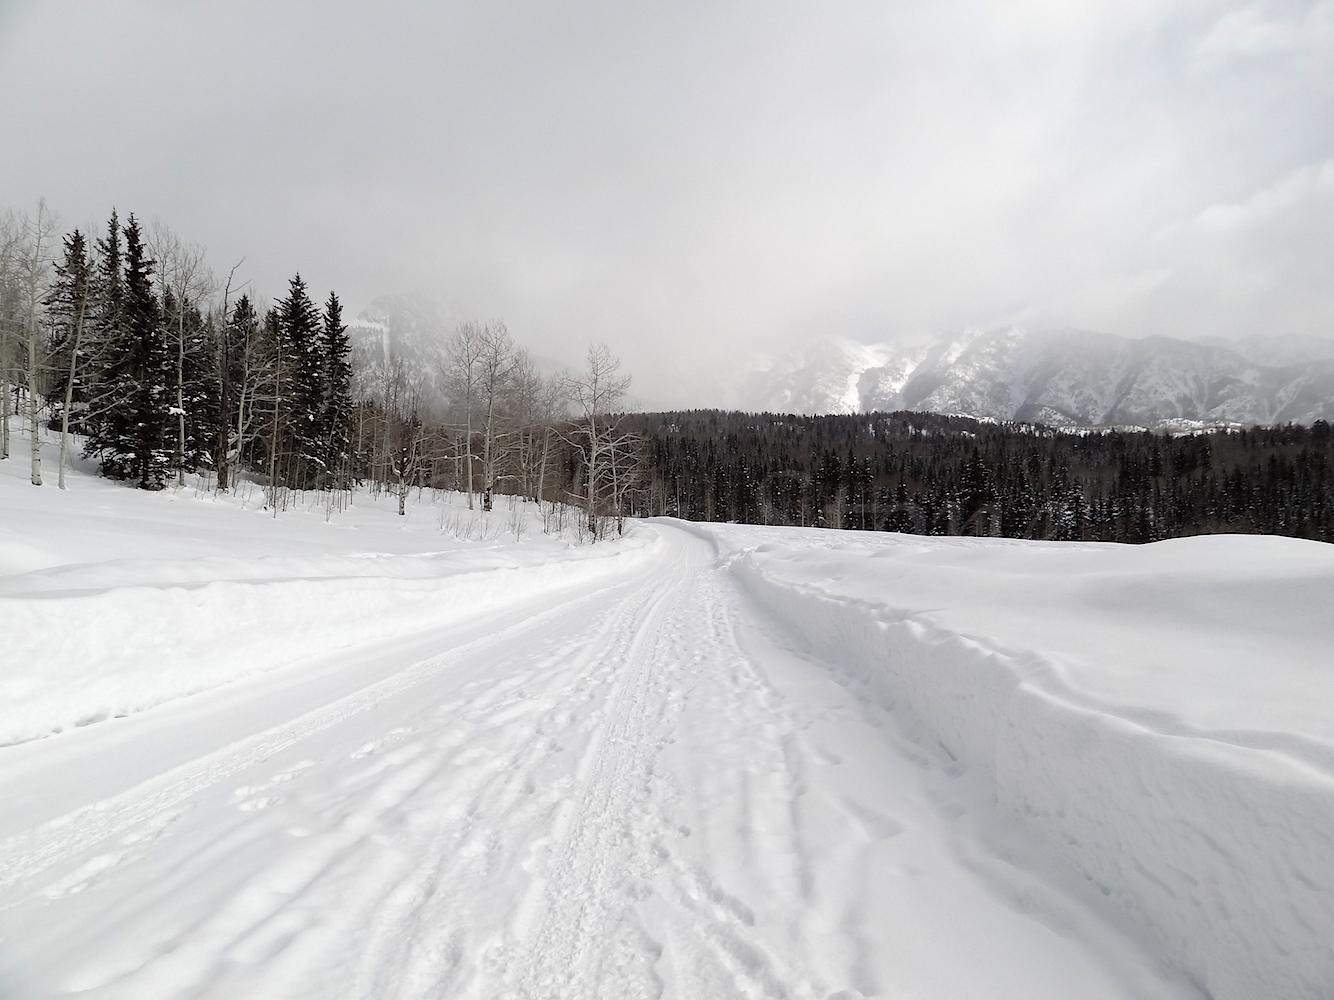 Lime Creek Road Snowshoe, Image #5195